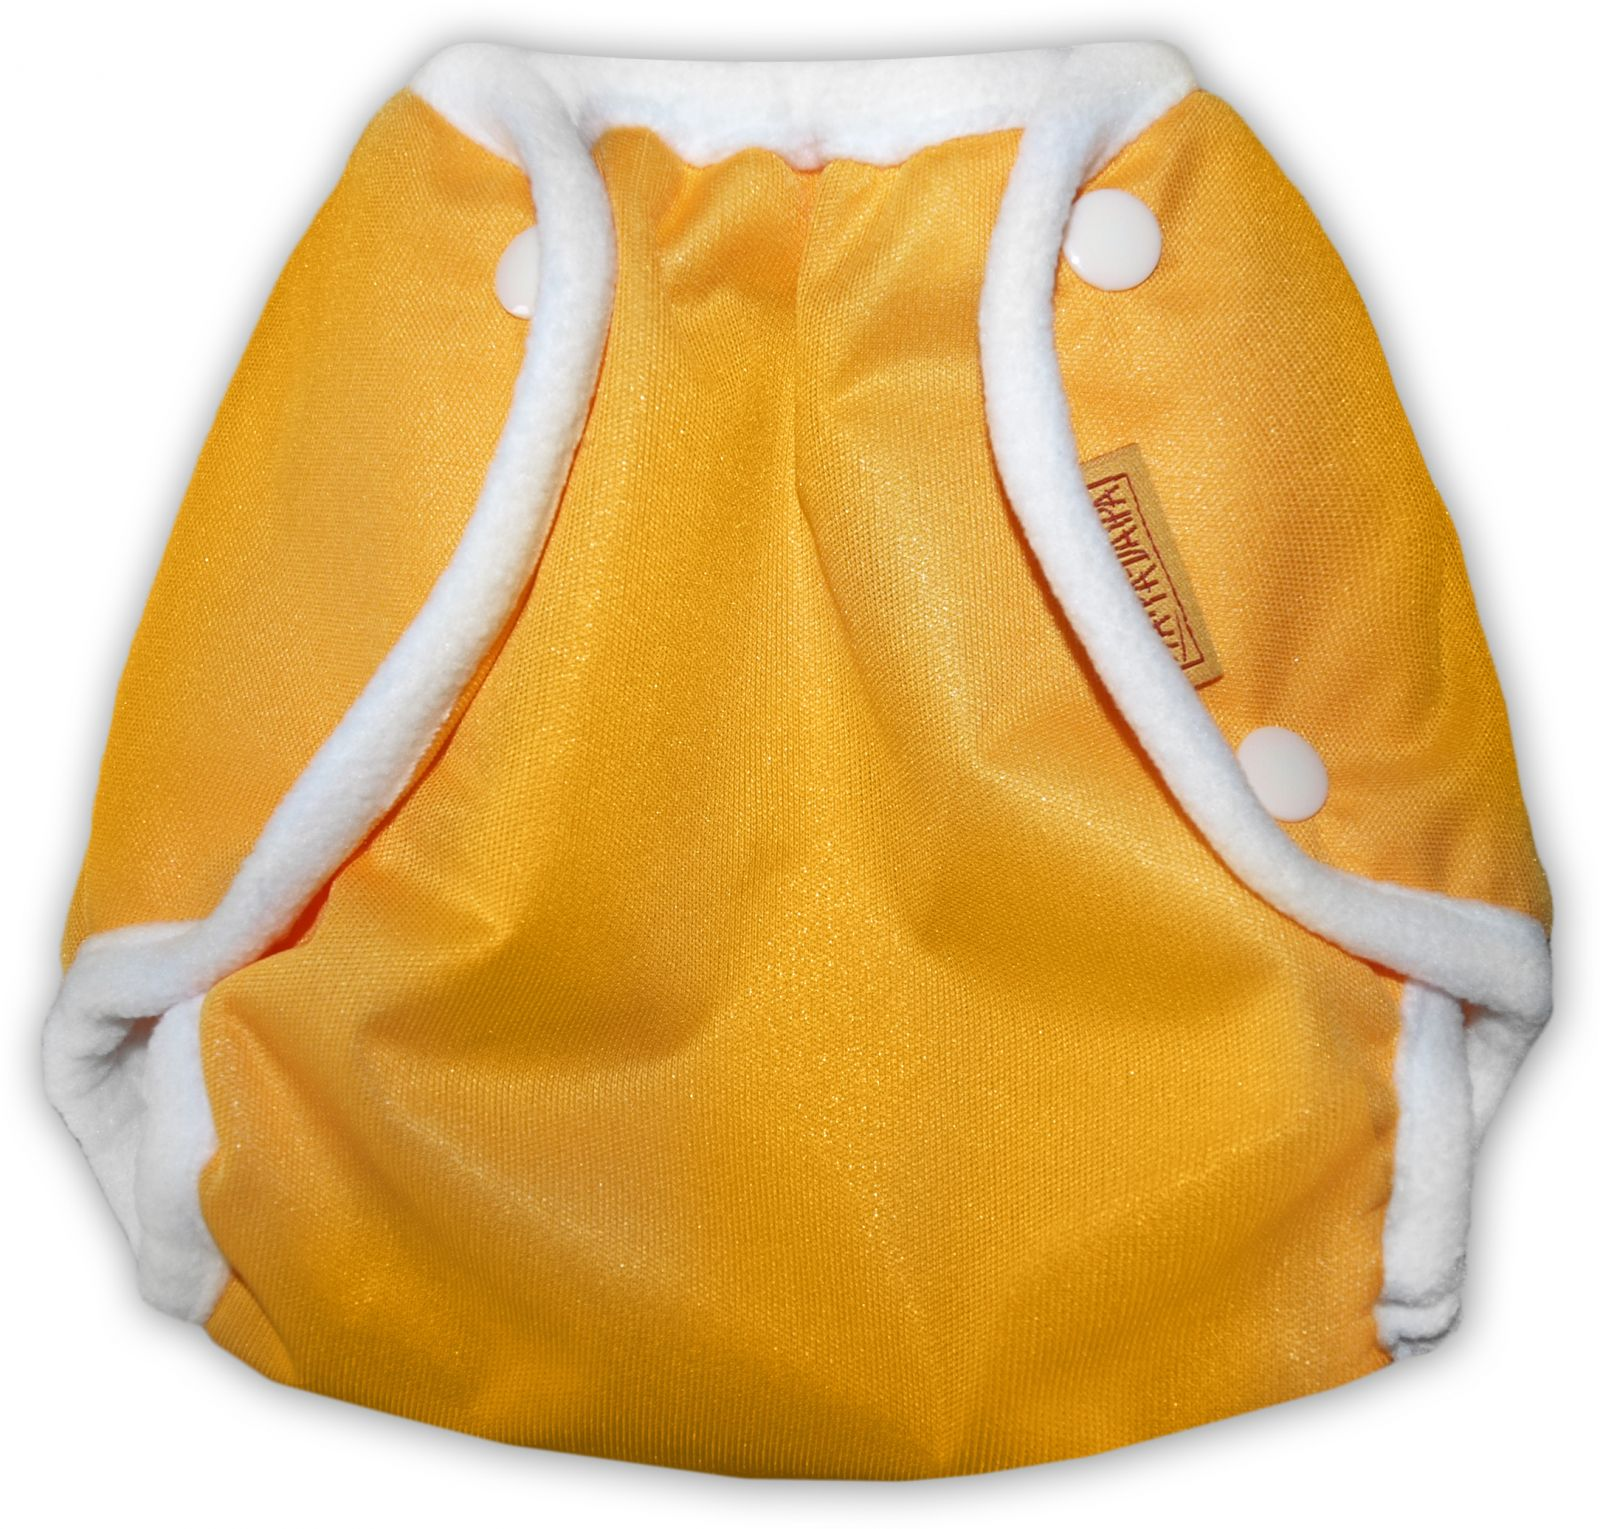 nnepromkovavé svrchní kalhotky na látkové pleny pul, oranžové s 3-7kg